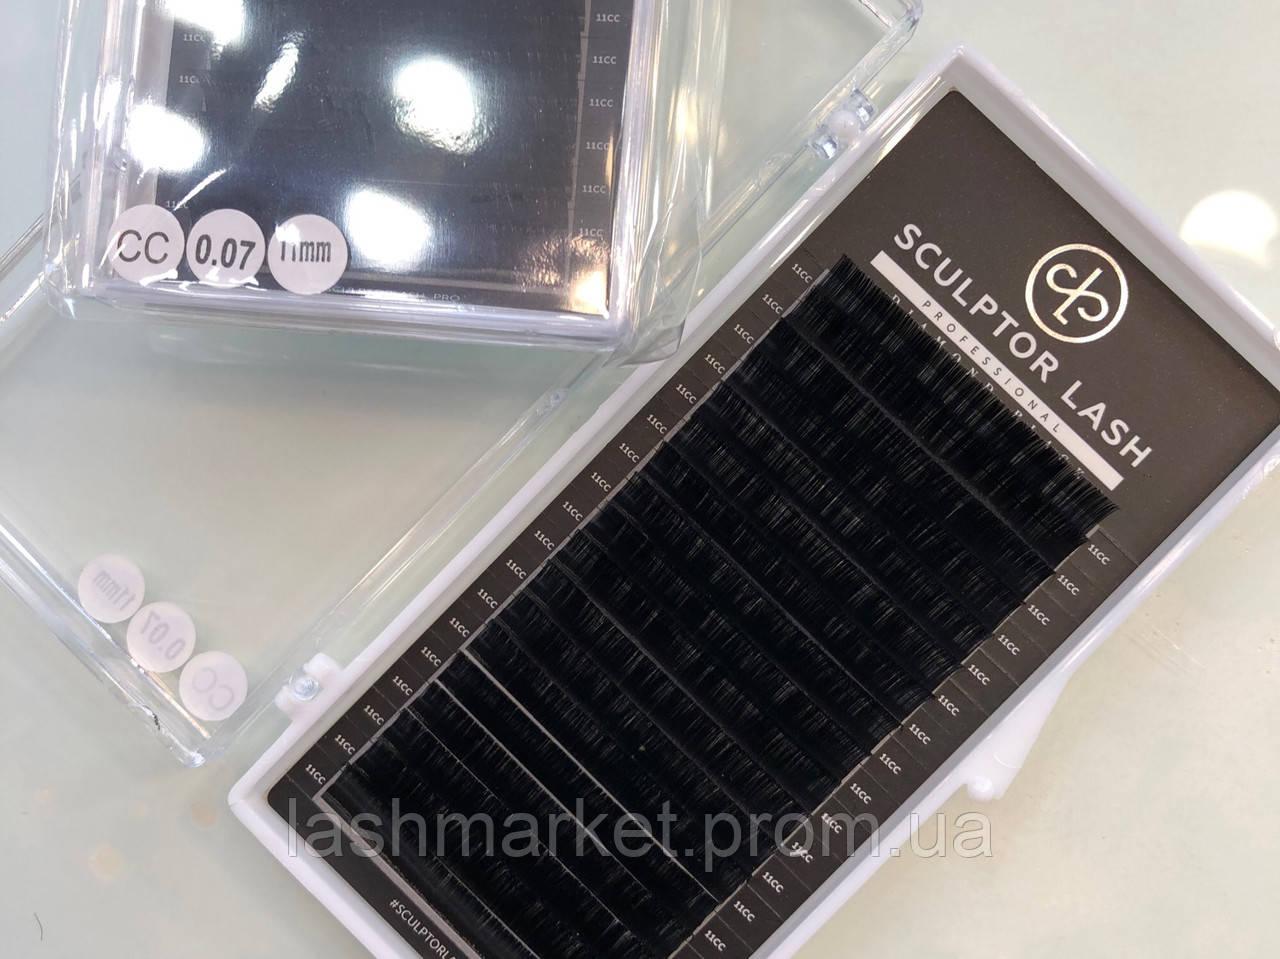 Ресницы CС 0,07 * 11 mm Sculptor Lash Diamond Black